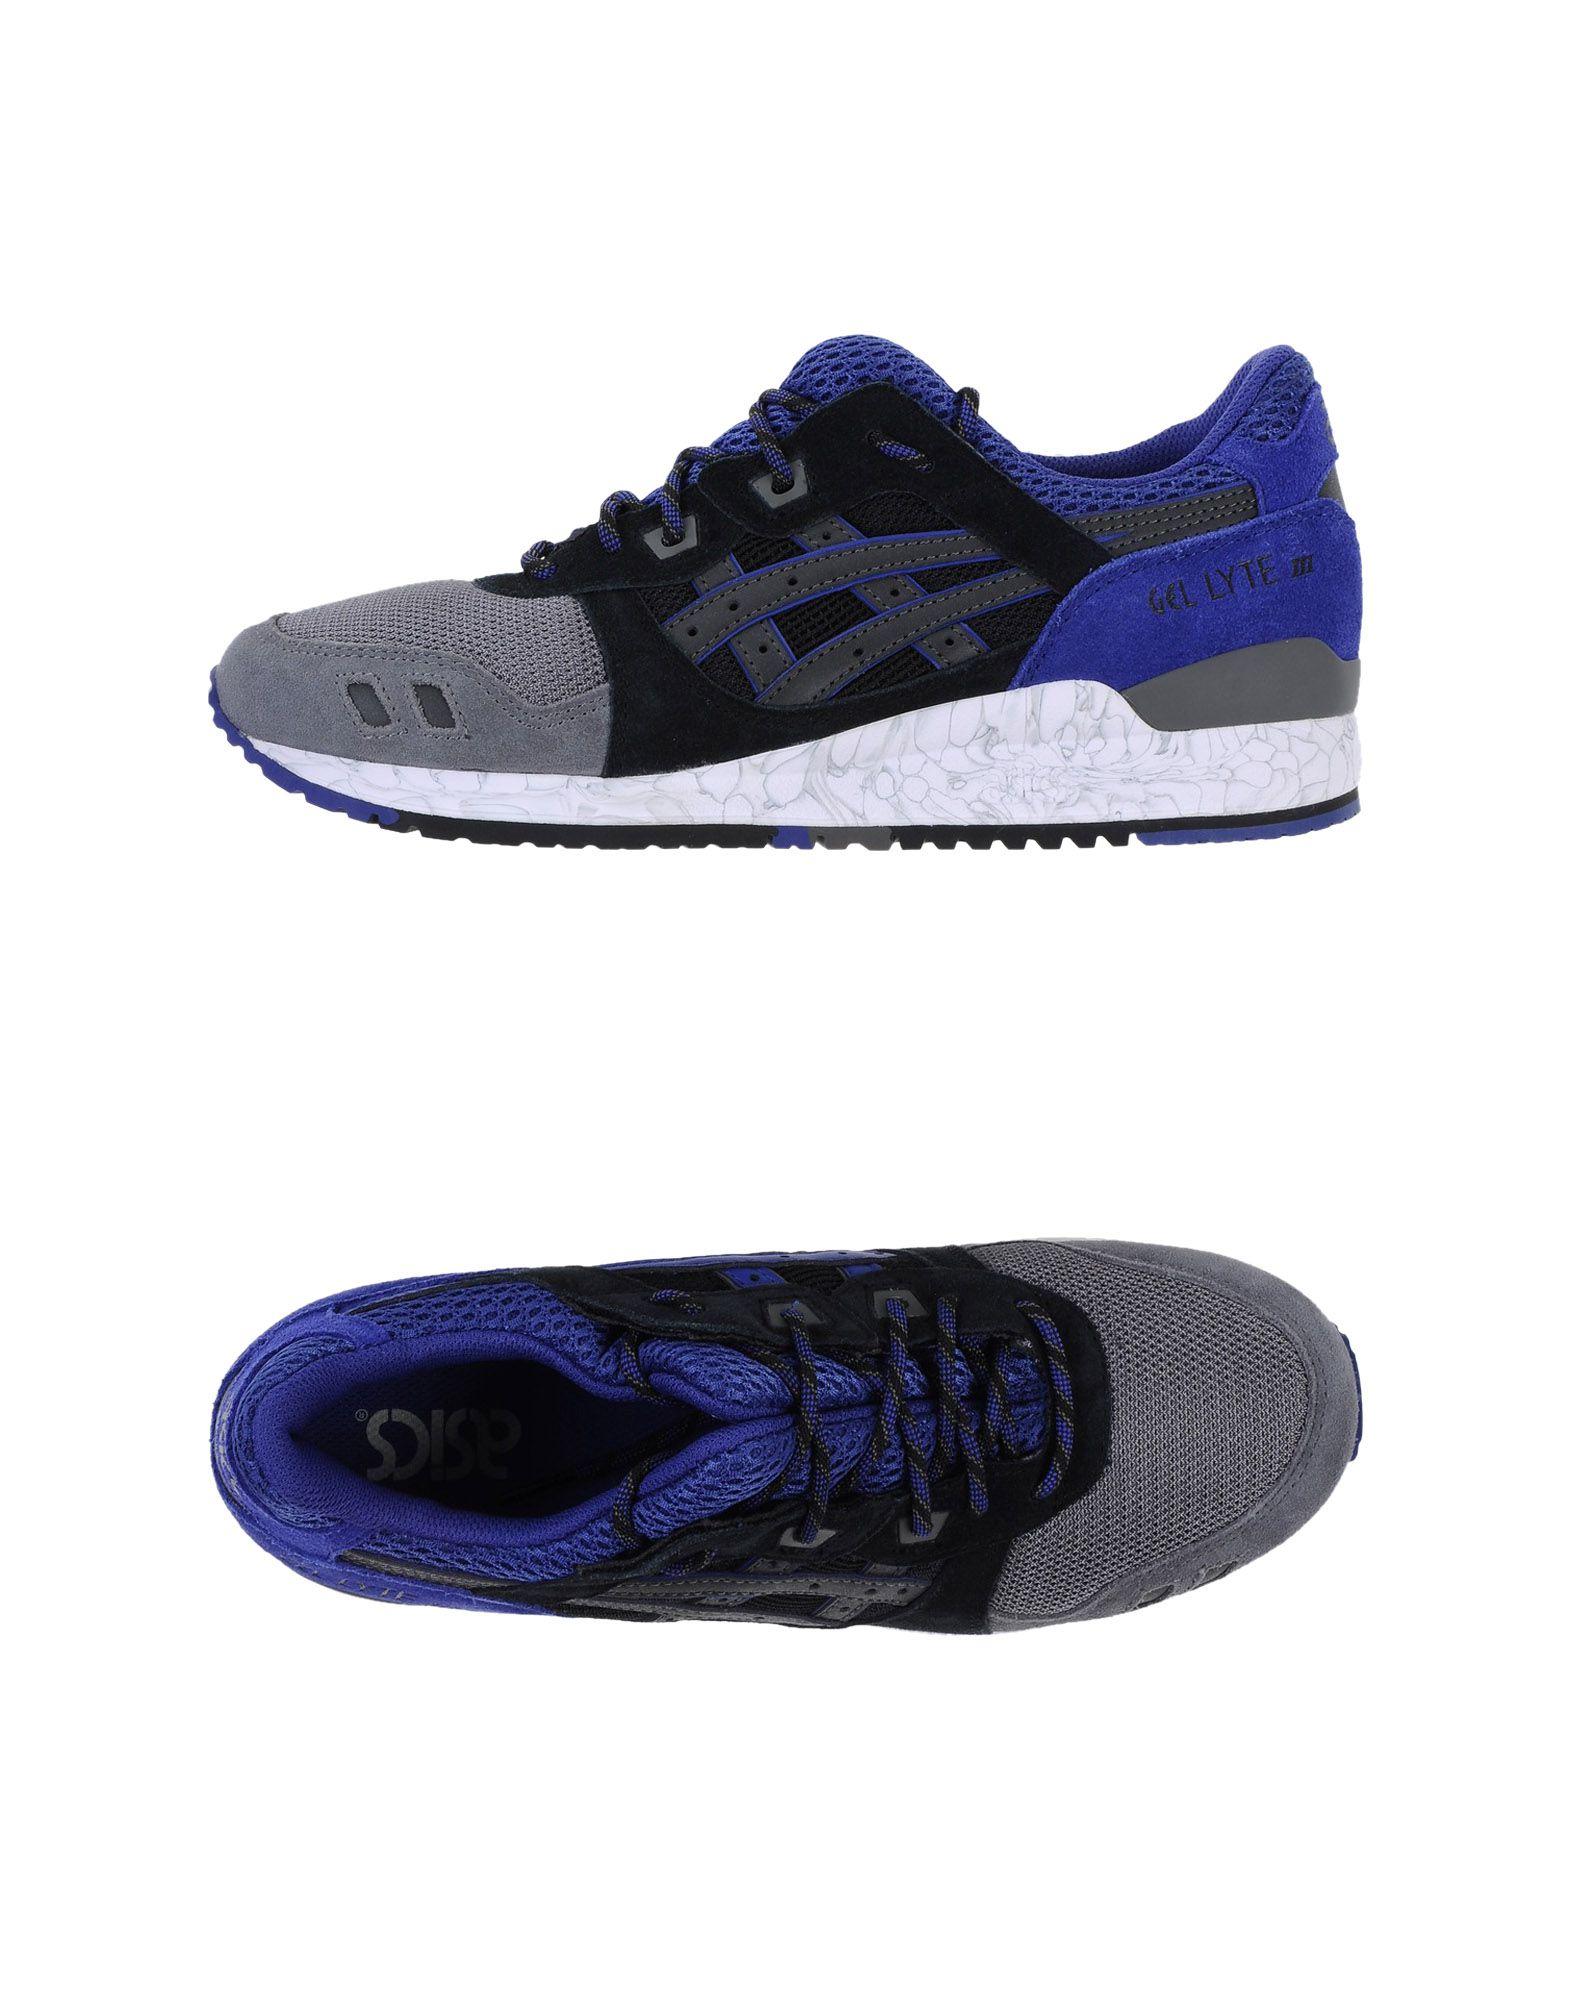 ASICS TIGER Herren Low Sneakers & Tennisschuhe Farbe Grau Größe 12